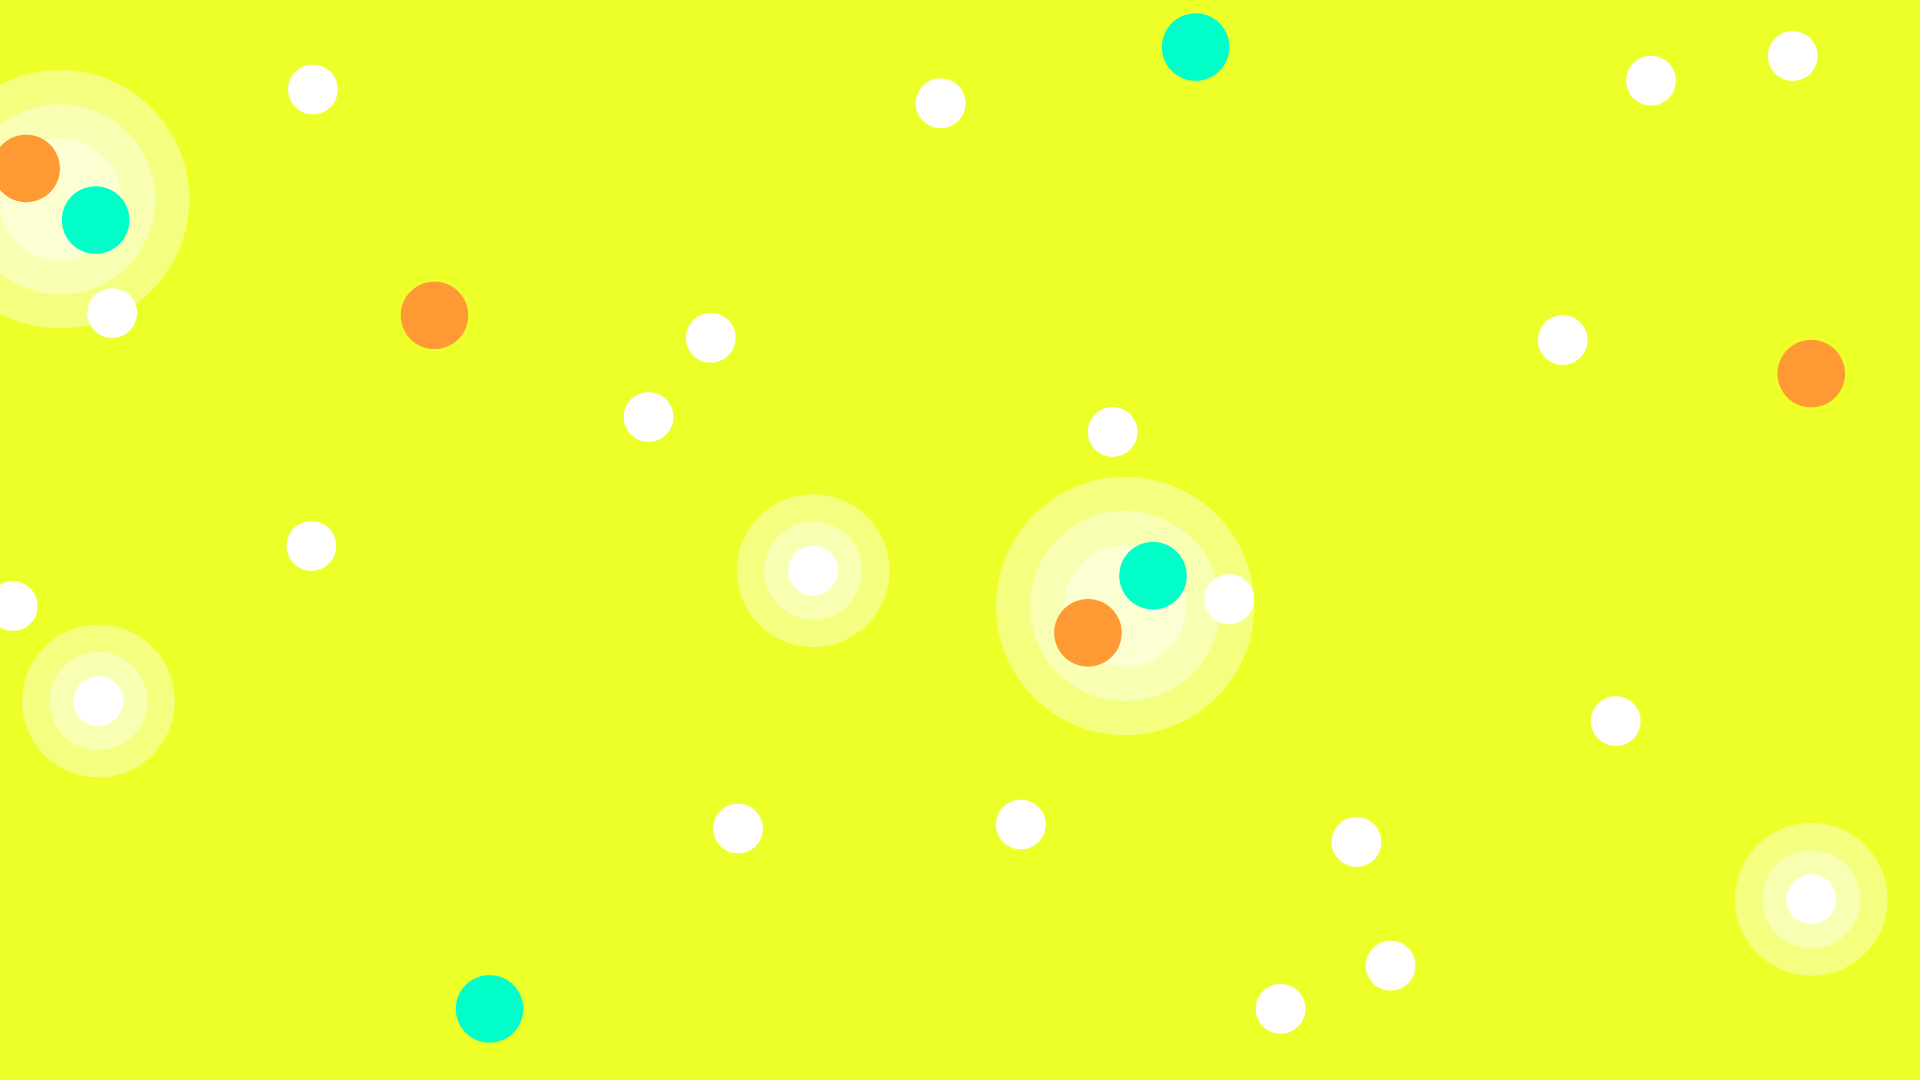 320_Big Bang_Kurzgesagt Project Pic 3